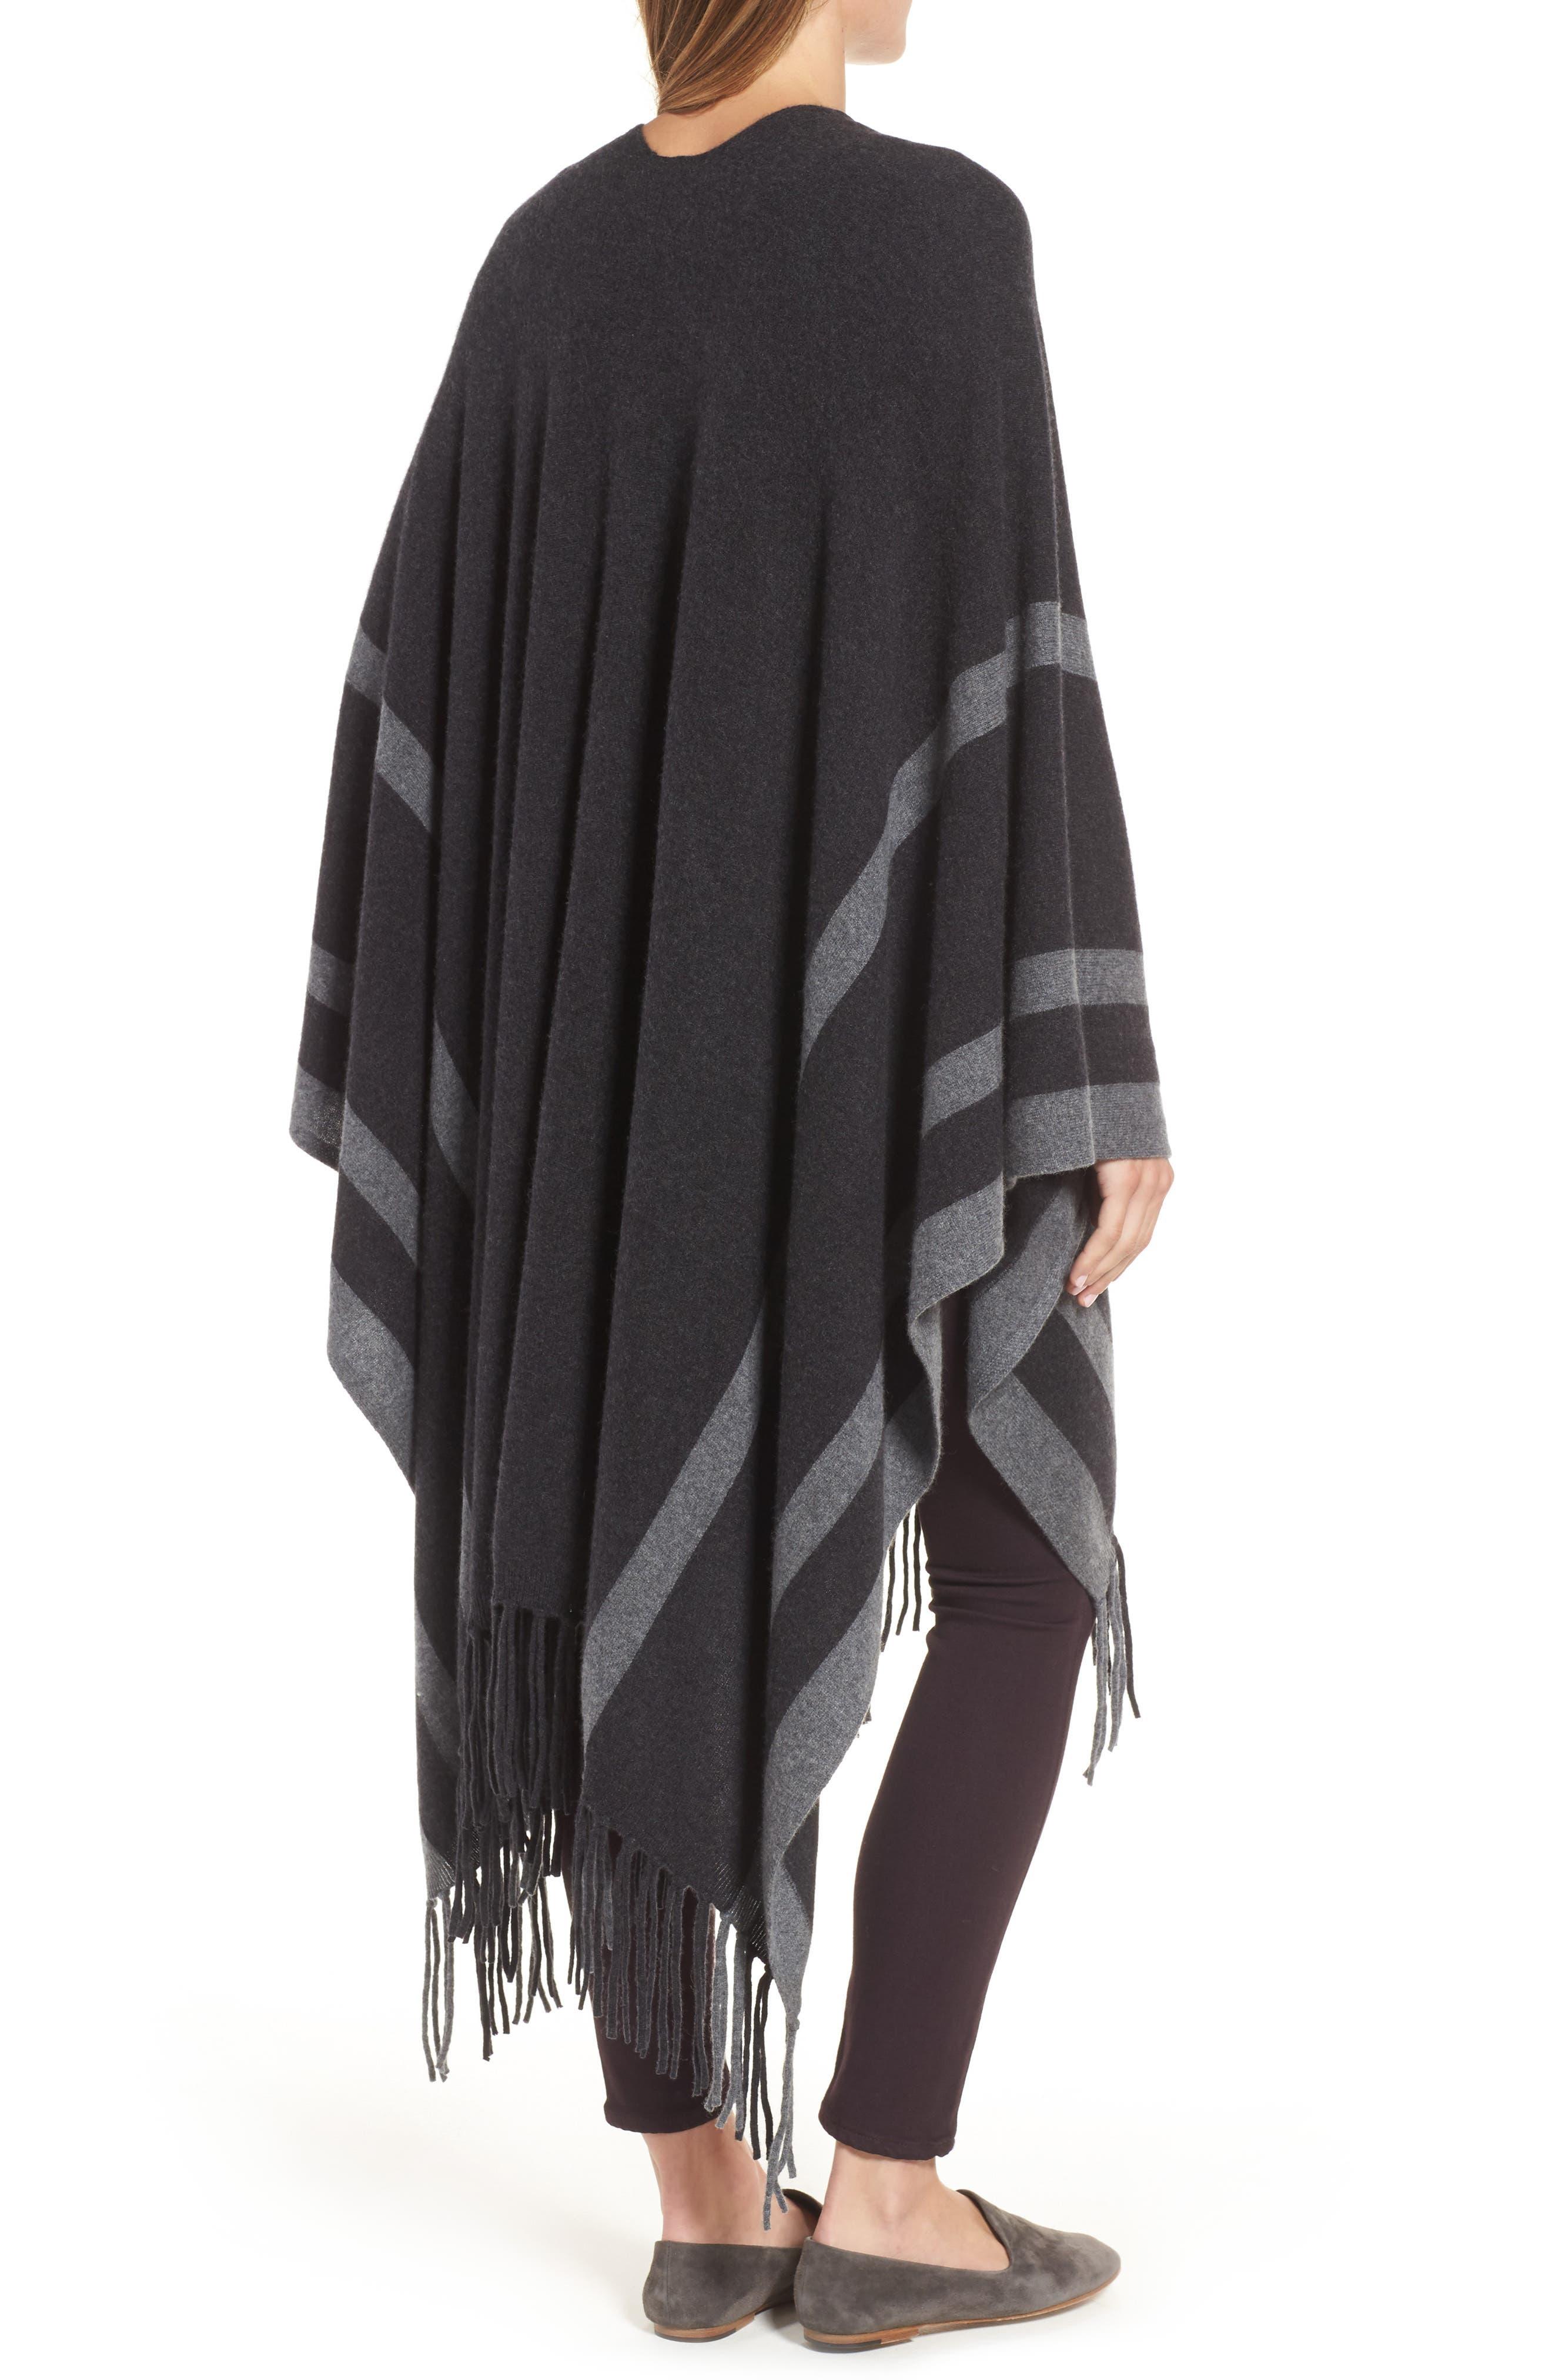 Luxe Stripe Cashmere Ruana,                             Alternate thumbnail 2, color,                             Black Rock Heather Combo